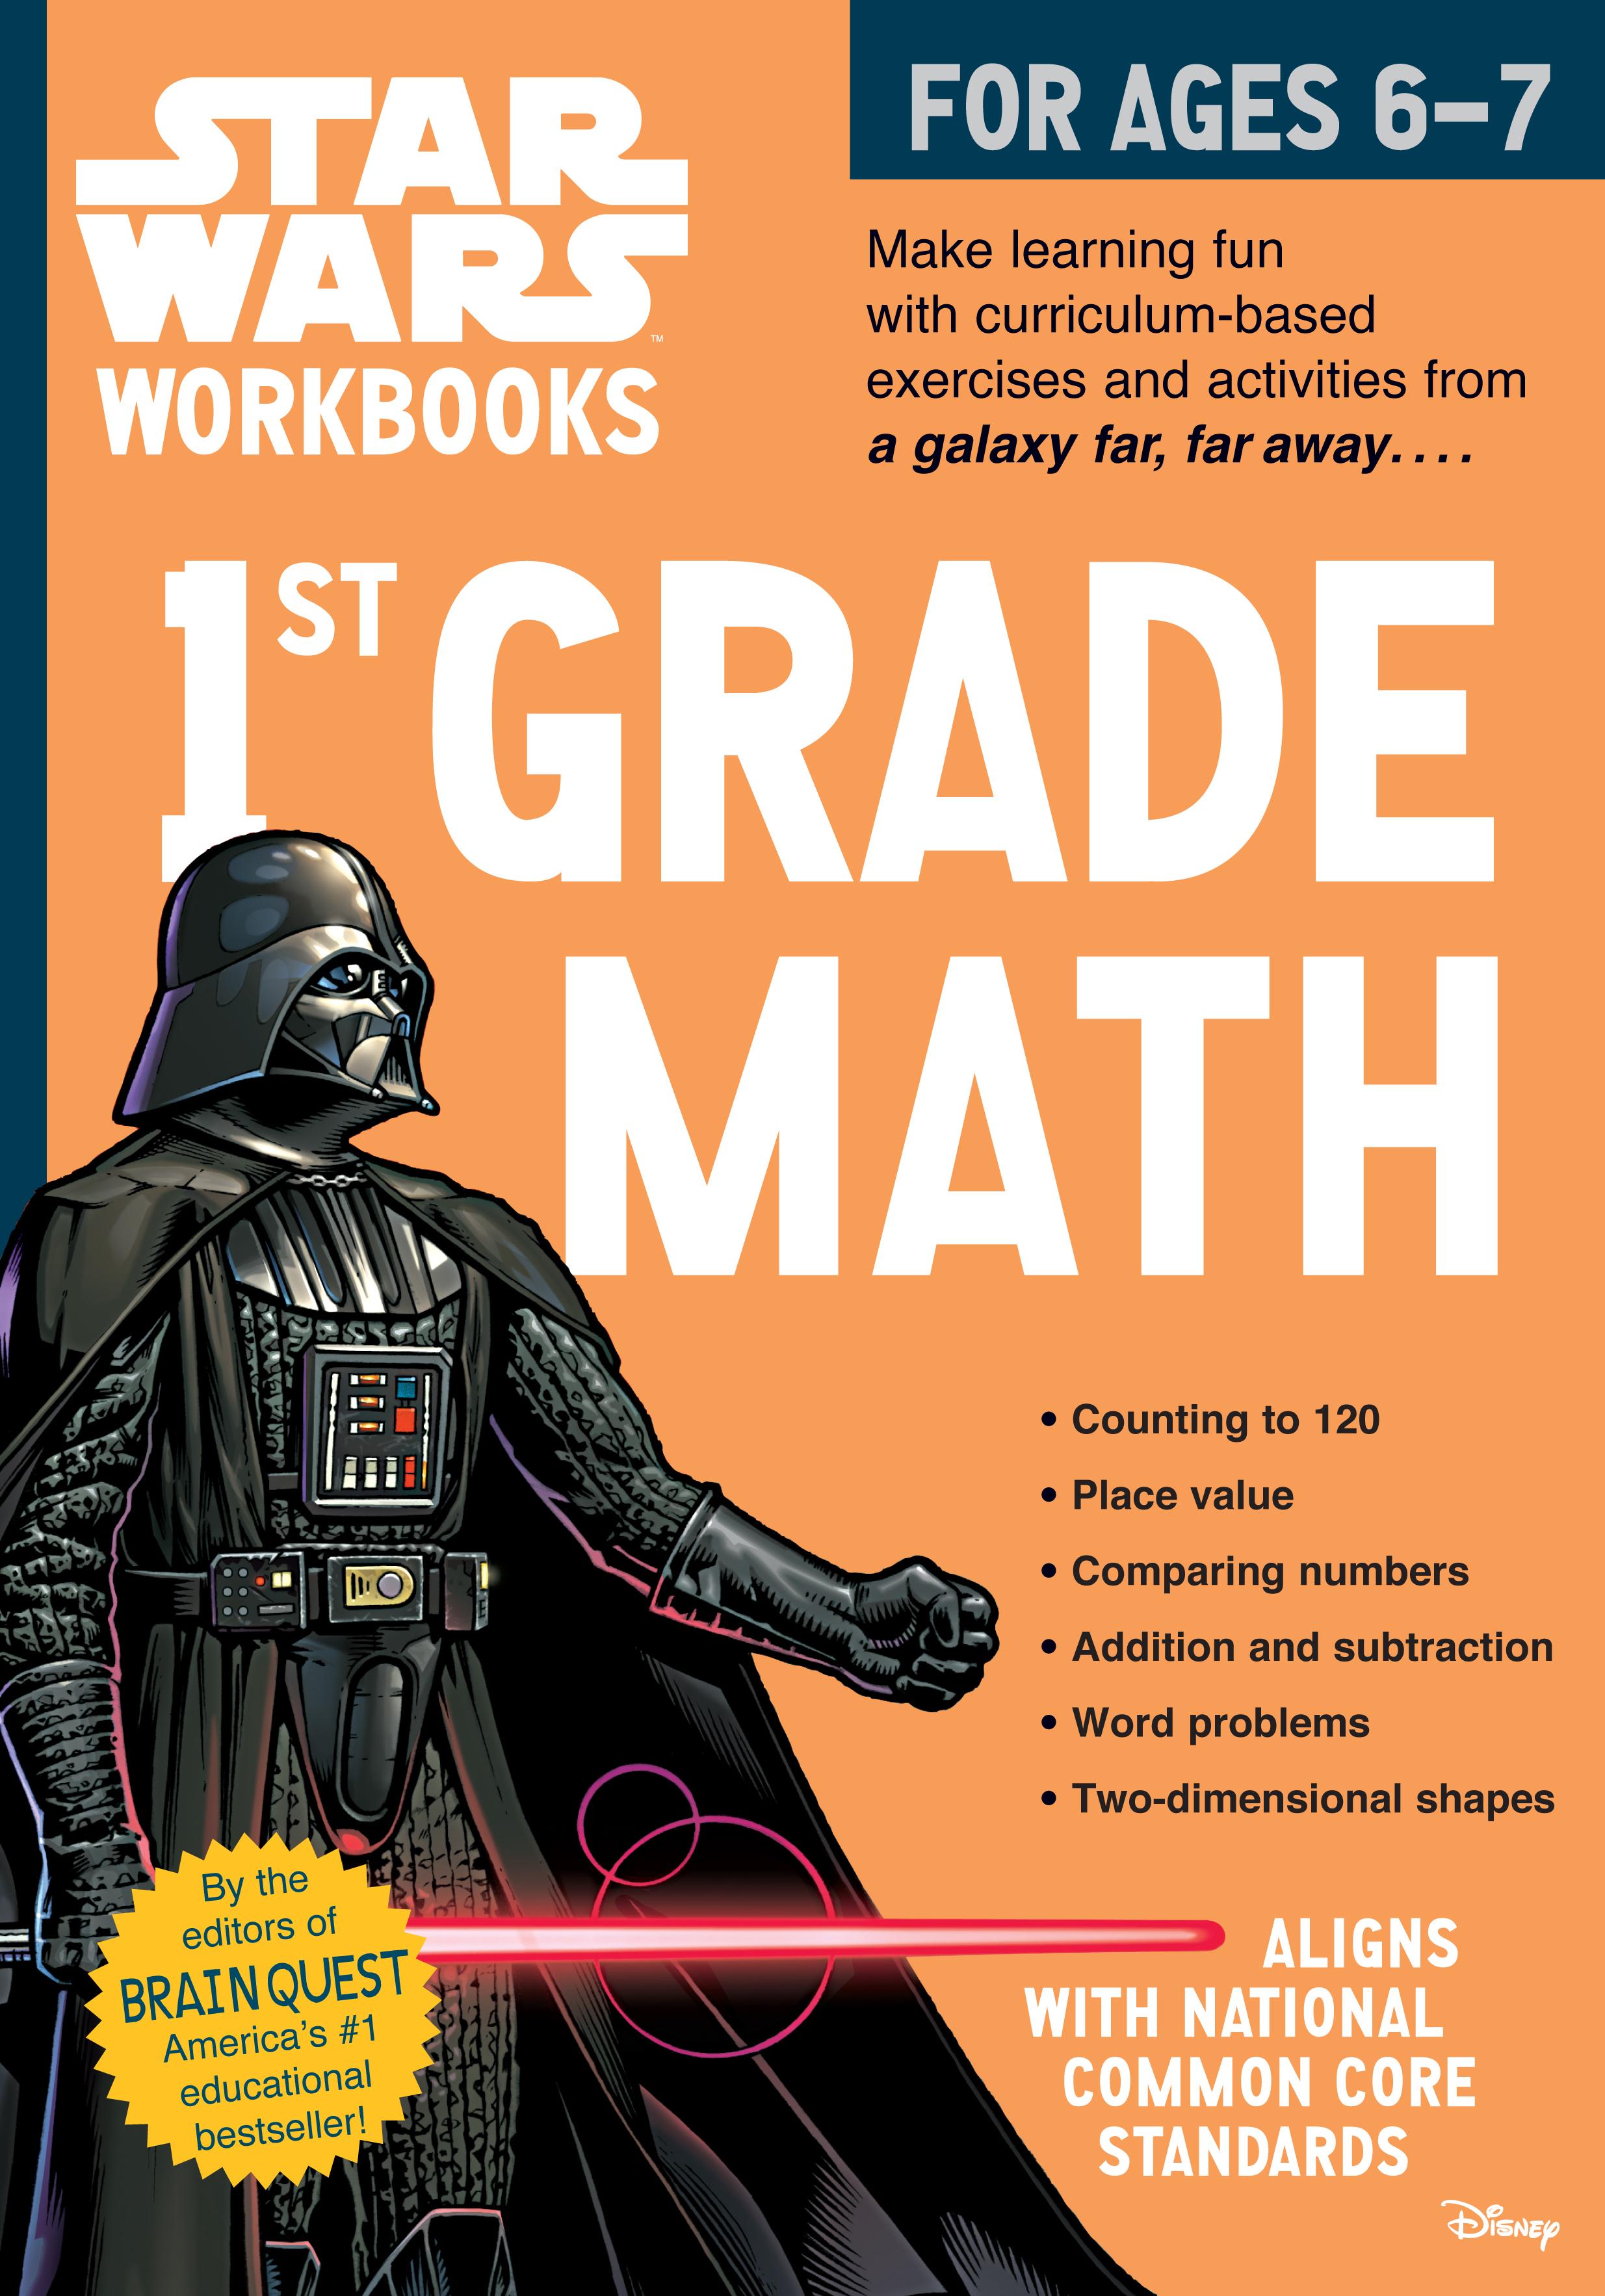 Worksheet 1st Grade Math Workbooks star wars workbook 1st grade math workman publishing download high res image